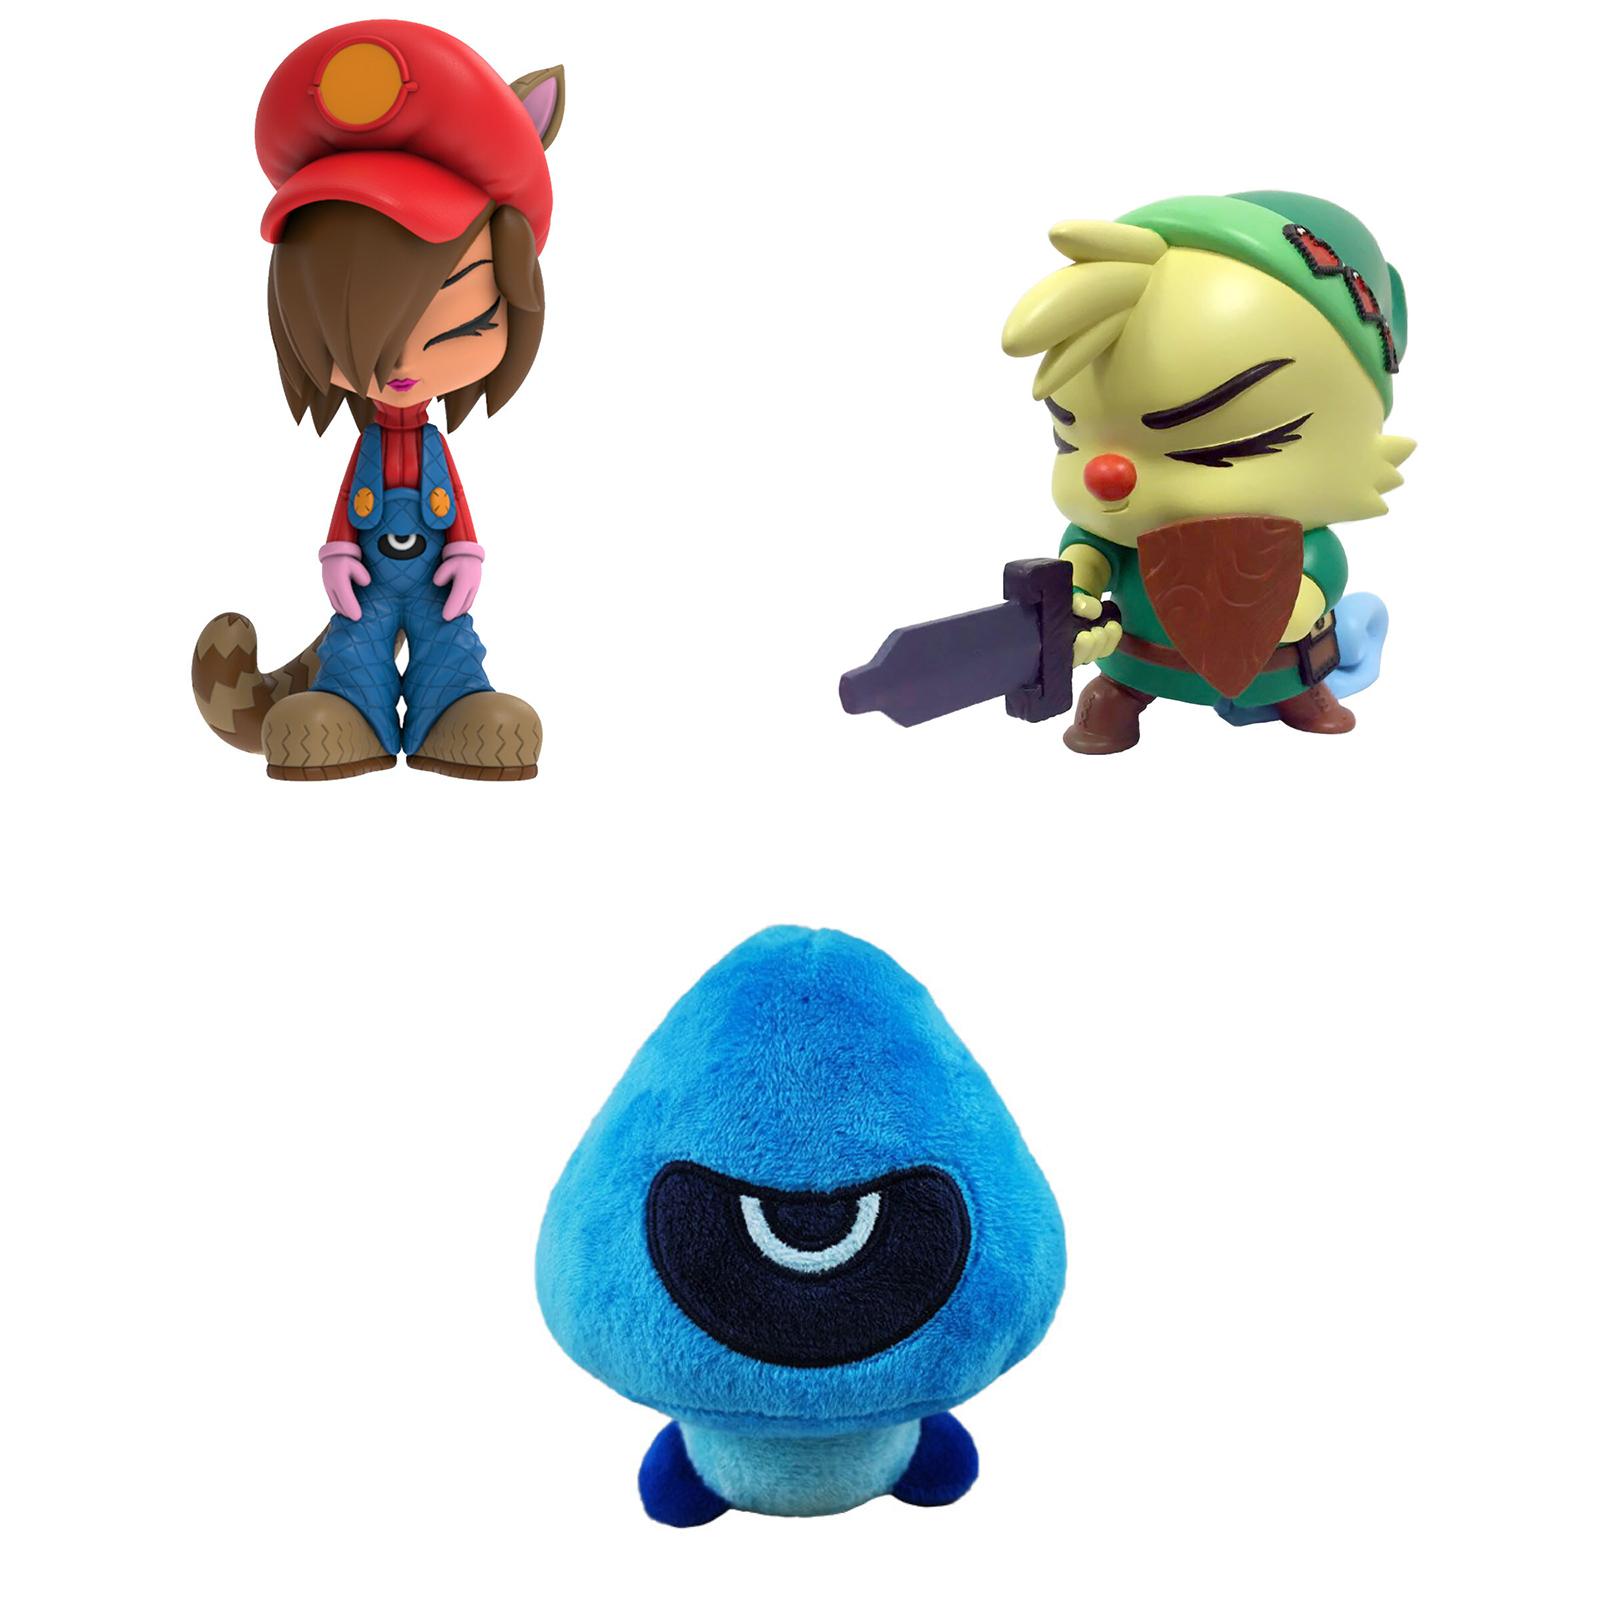 ESC-Toy Anniversary Releases